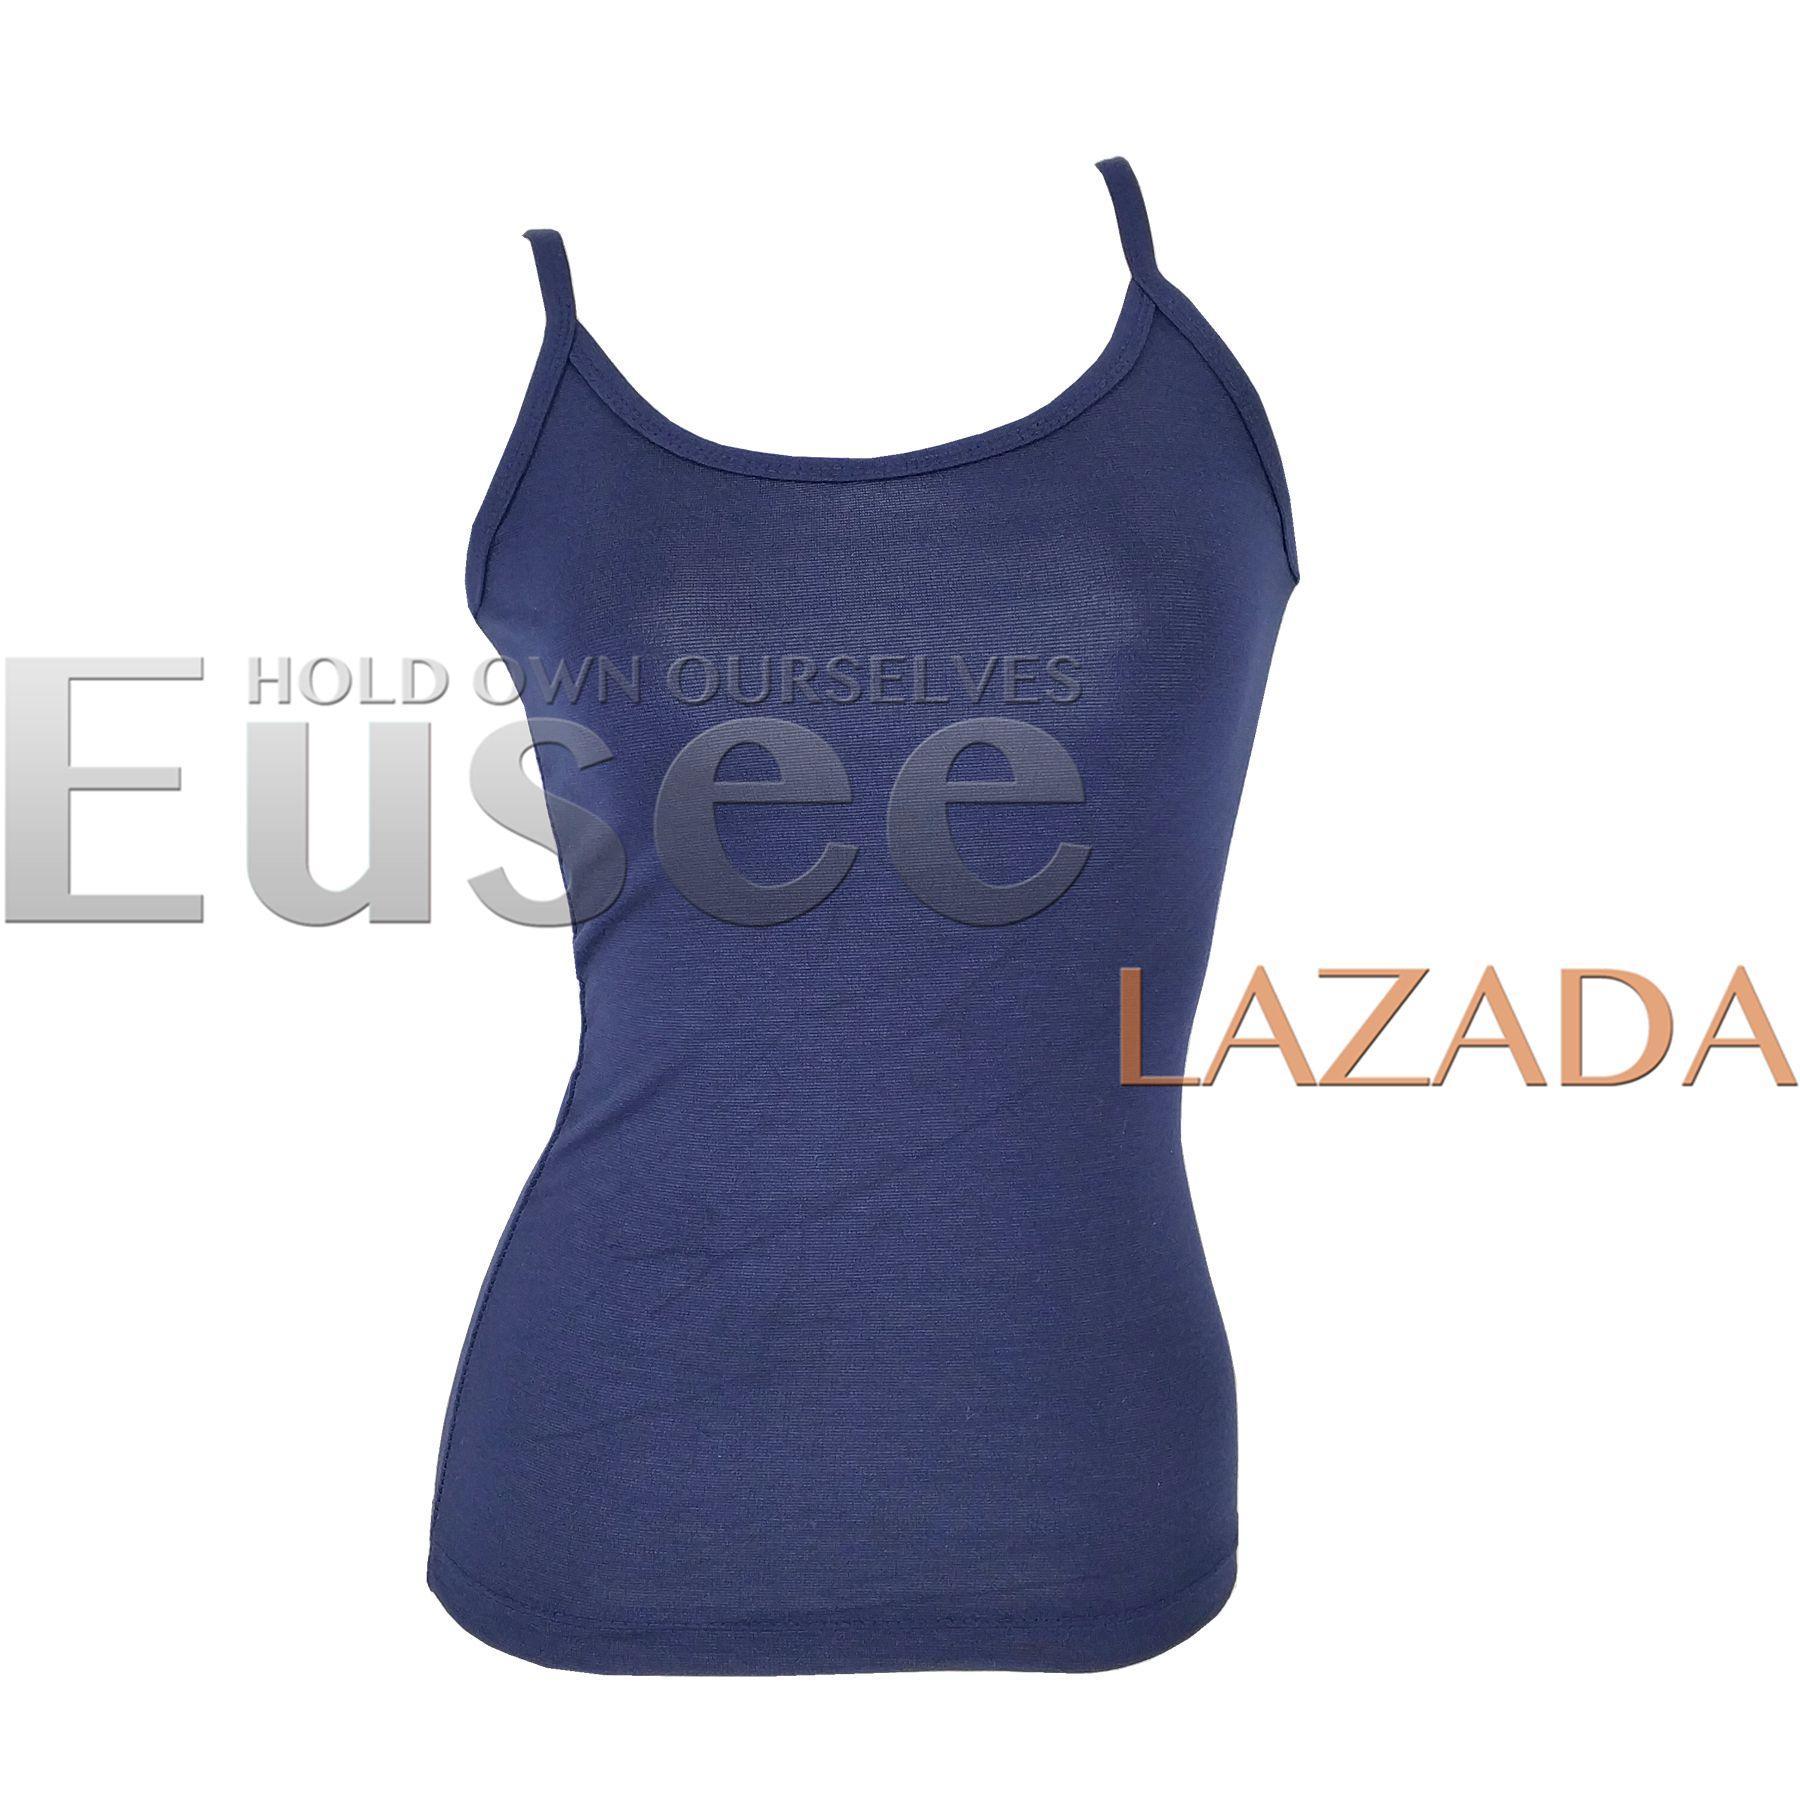 5dda2ddf909 Tank Tops for Women for sale - Camisole for Women online brands ...